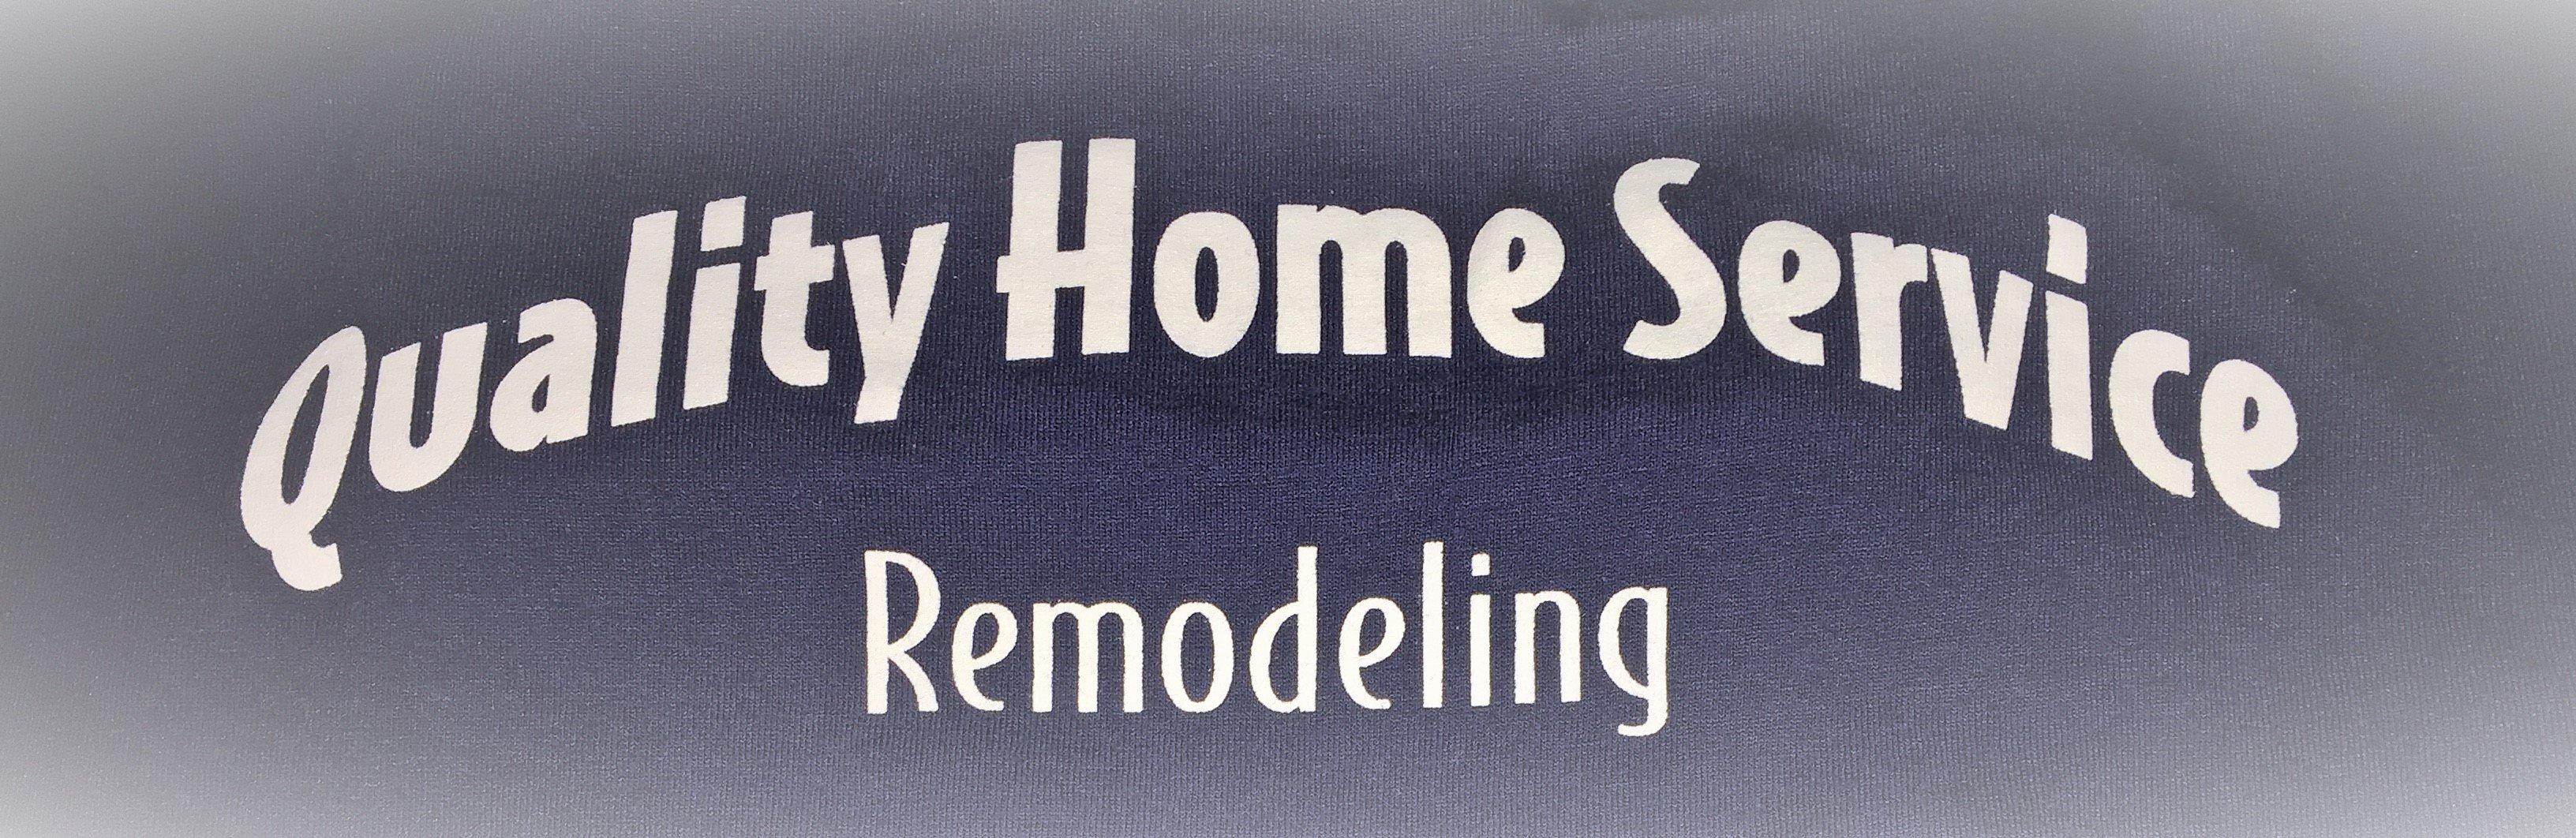 Quality Home Service